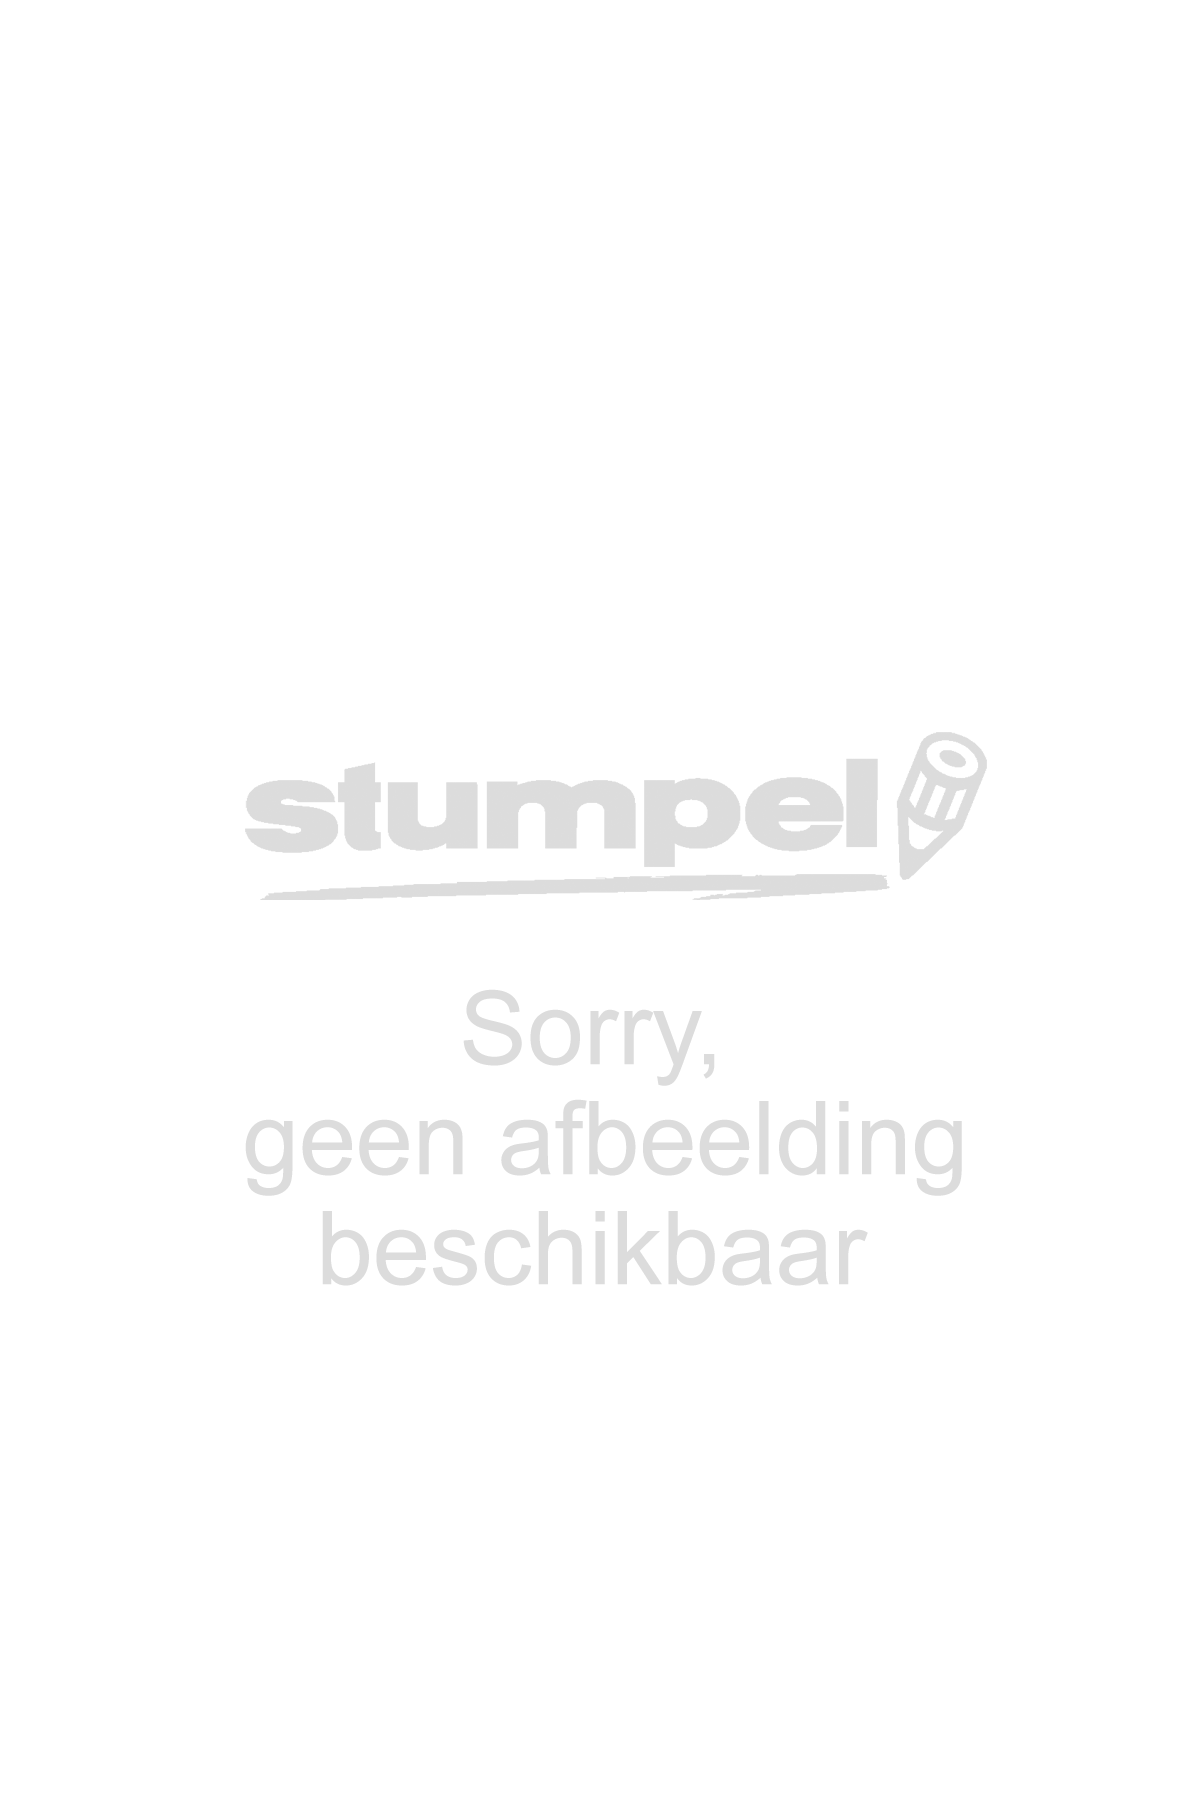 Stylusbalpen 4in1 Leitz 6414 Complete zwart